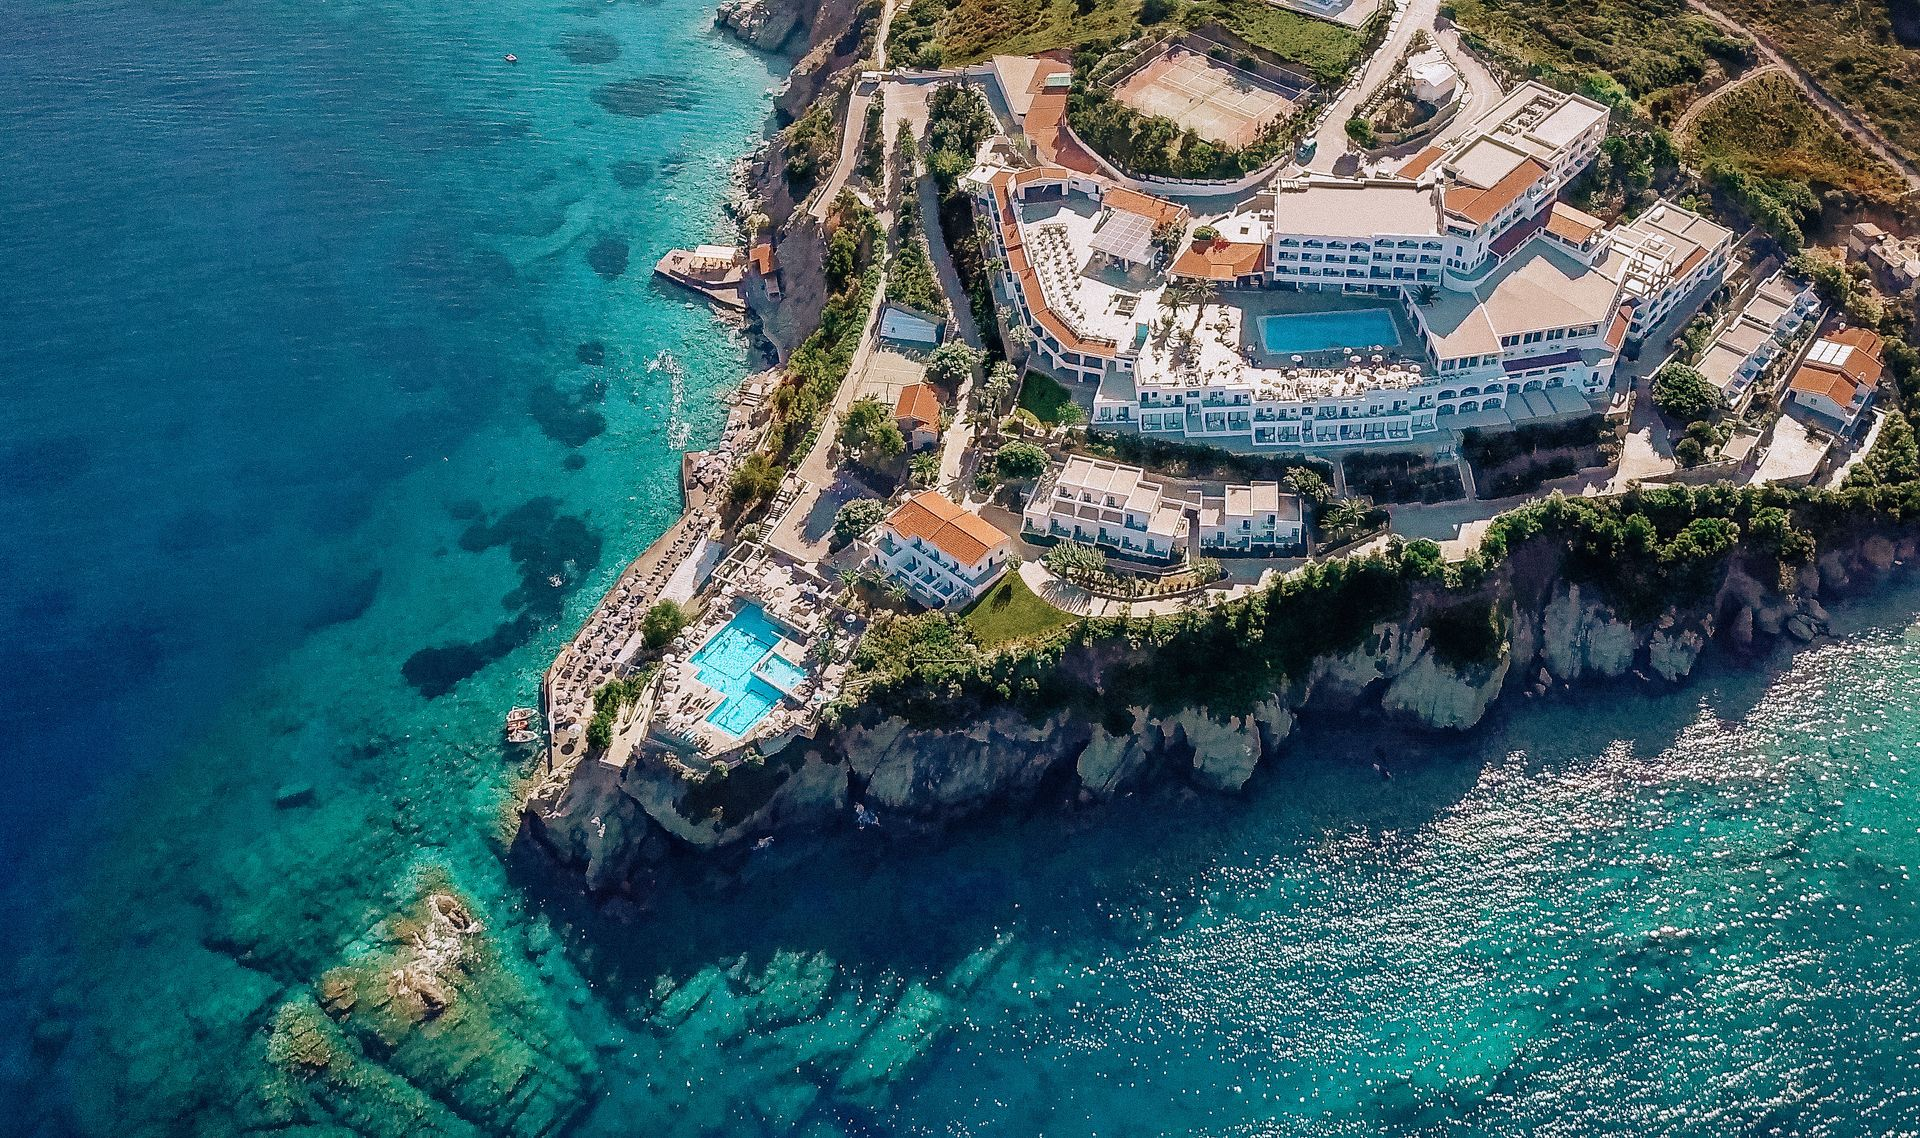 4* Peninsula Resort & Spa Crete - Αγία Πελαγία, Κρήτη ✦ 2 Ημέρες (1 Διανυκτέρευση) ✦ 2 άτομα + 1 παιδί έως 11 ετών ✦ Ημιδιατροφή ✦ 27/08/2020 έως 20/09/2020 ✦ Μπροστά στην Παραλία!